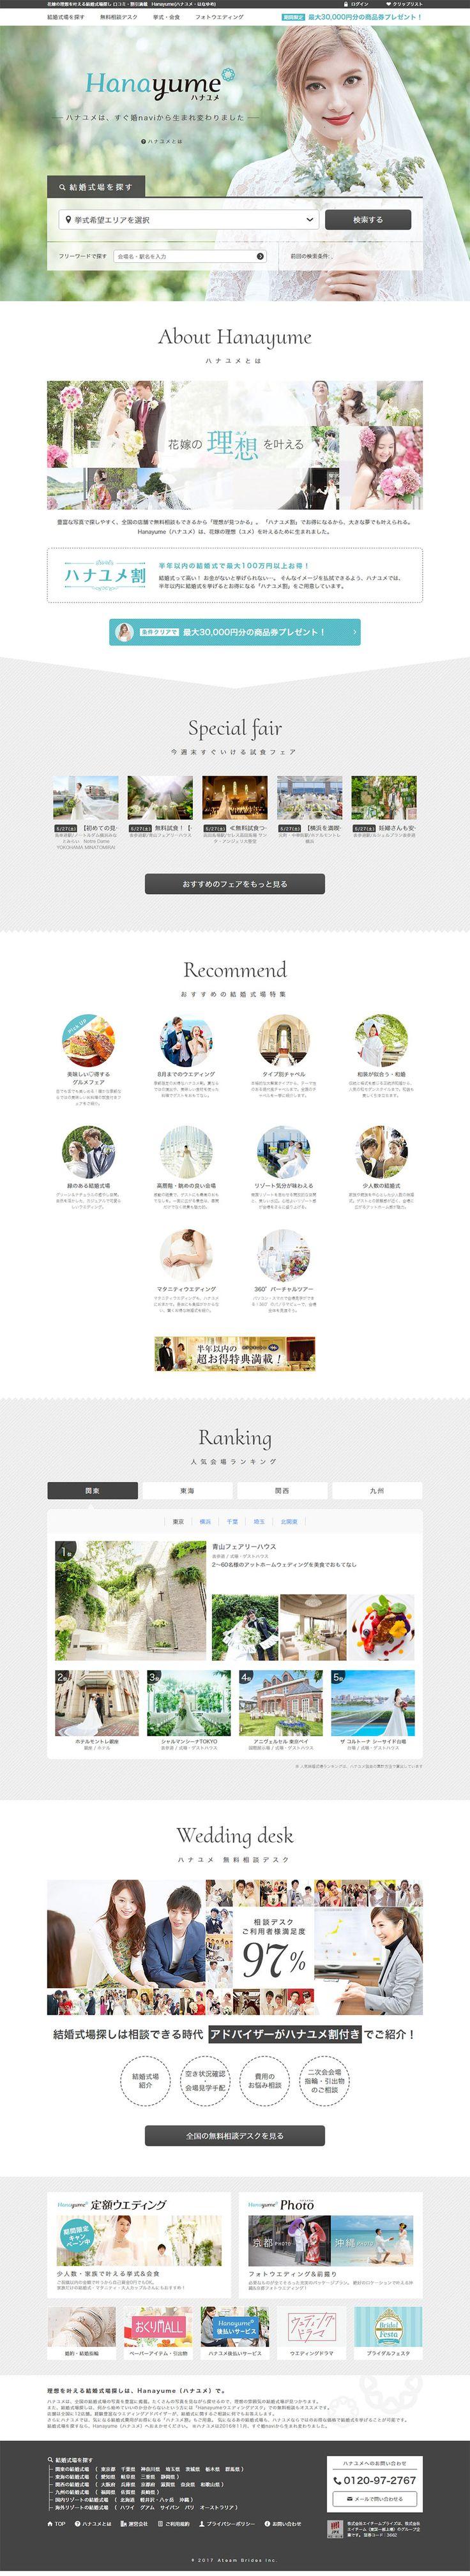 Hanayume|WEBデザイナーさん必見!ランディングページのデザイン参考に(ナチュラル系)